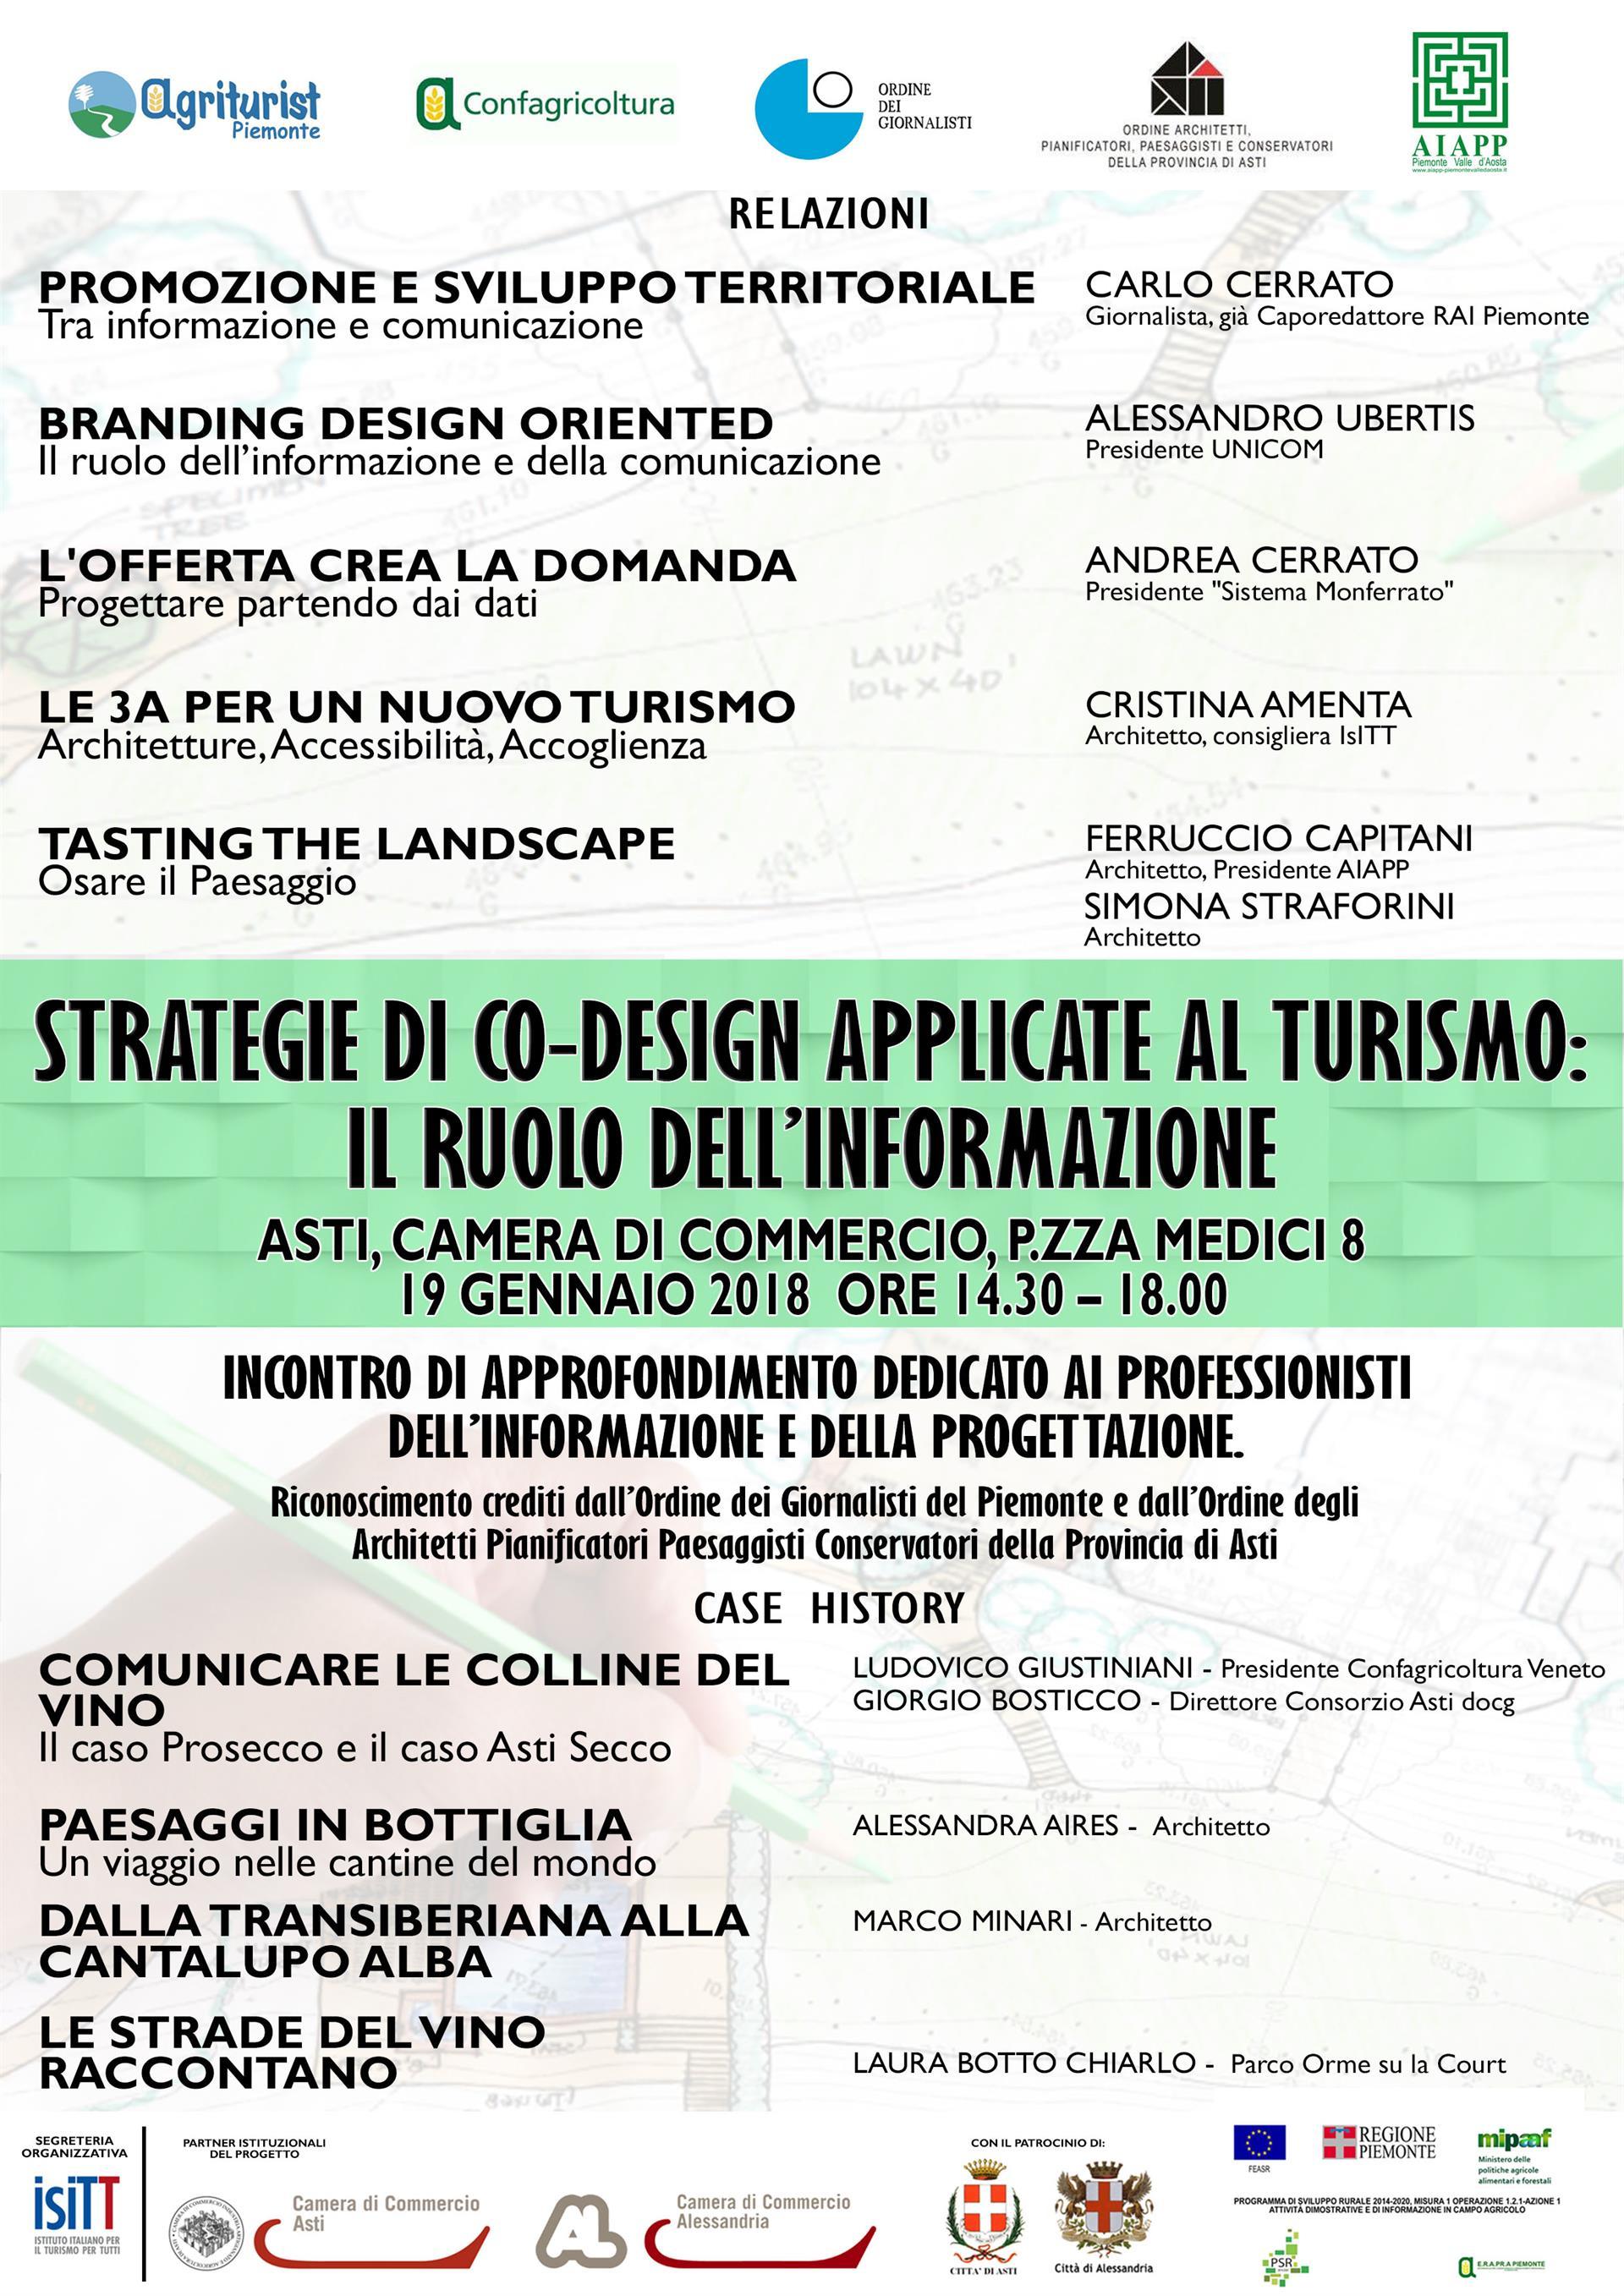 monferrato-19-gennaio-2018_07-2